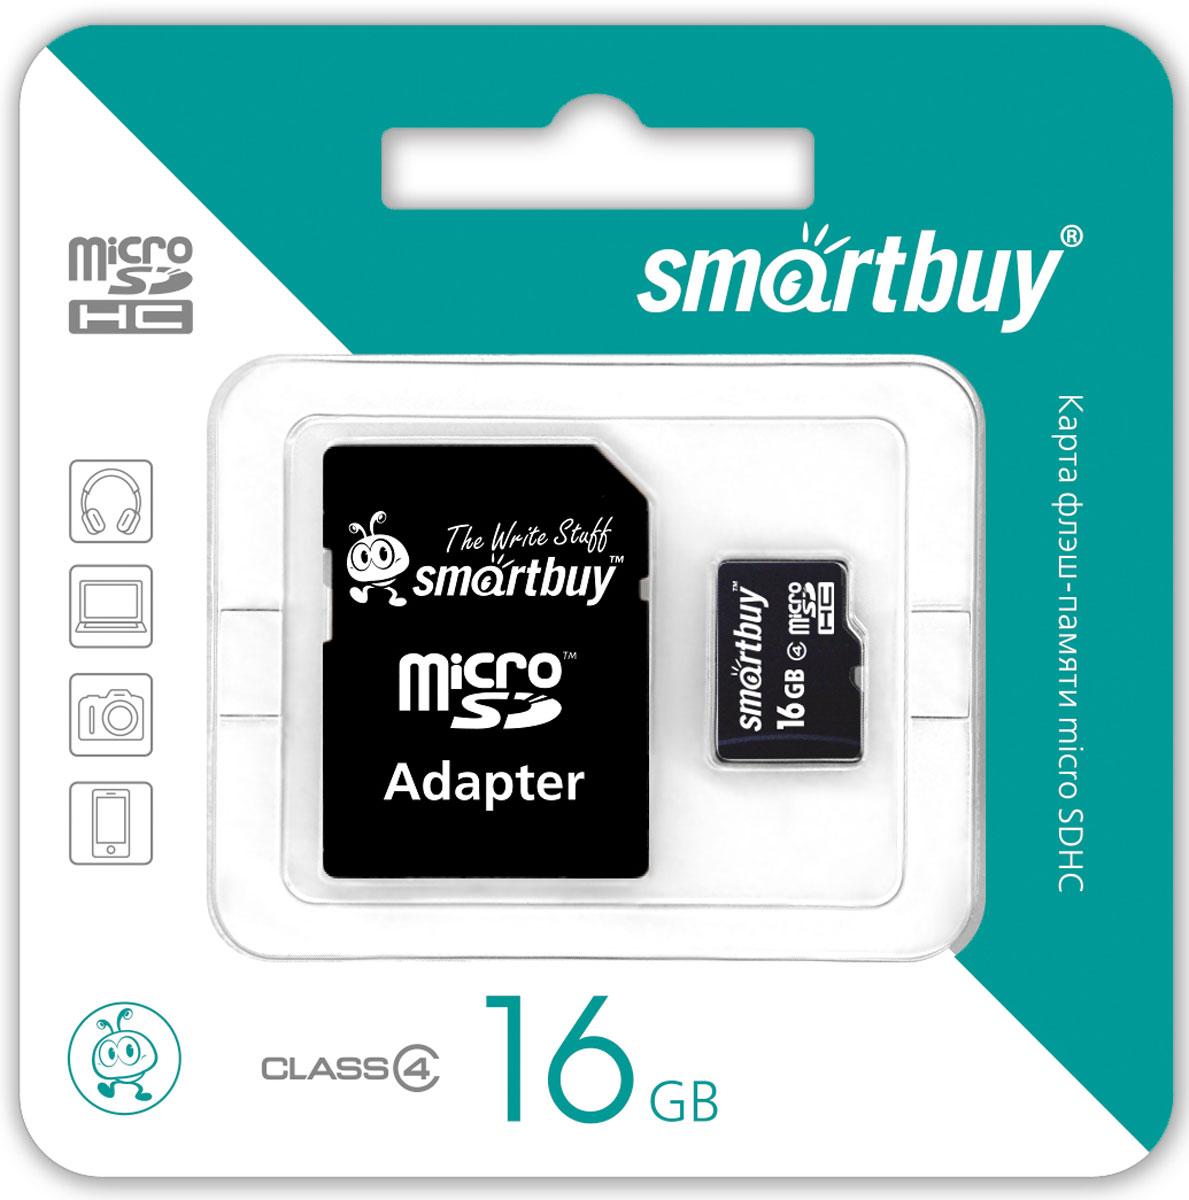 SmartBuy microSDHC Class 4 16GB карта памяти (с адаптером SD) стоимость